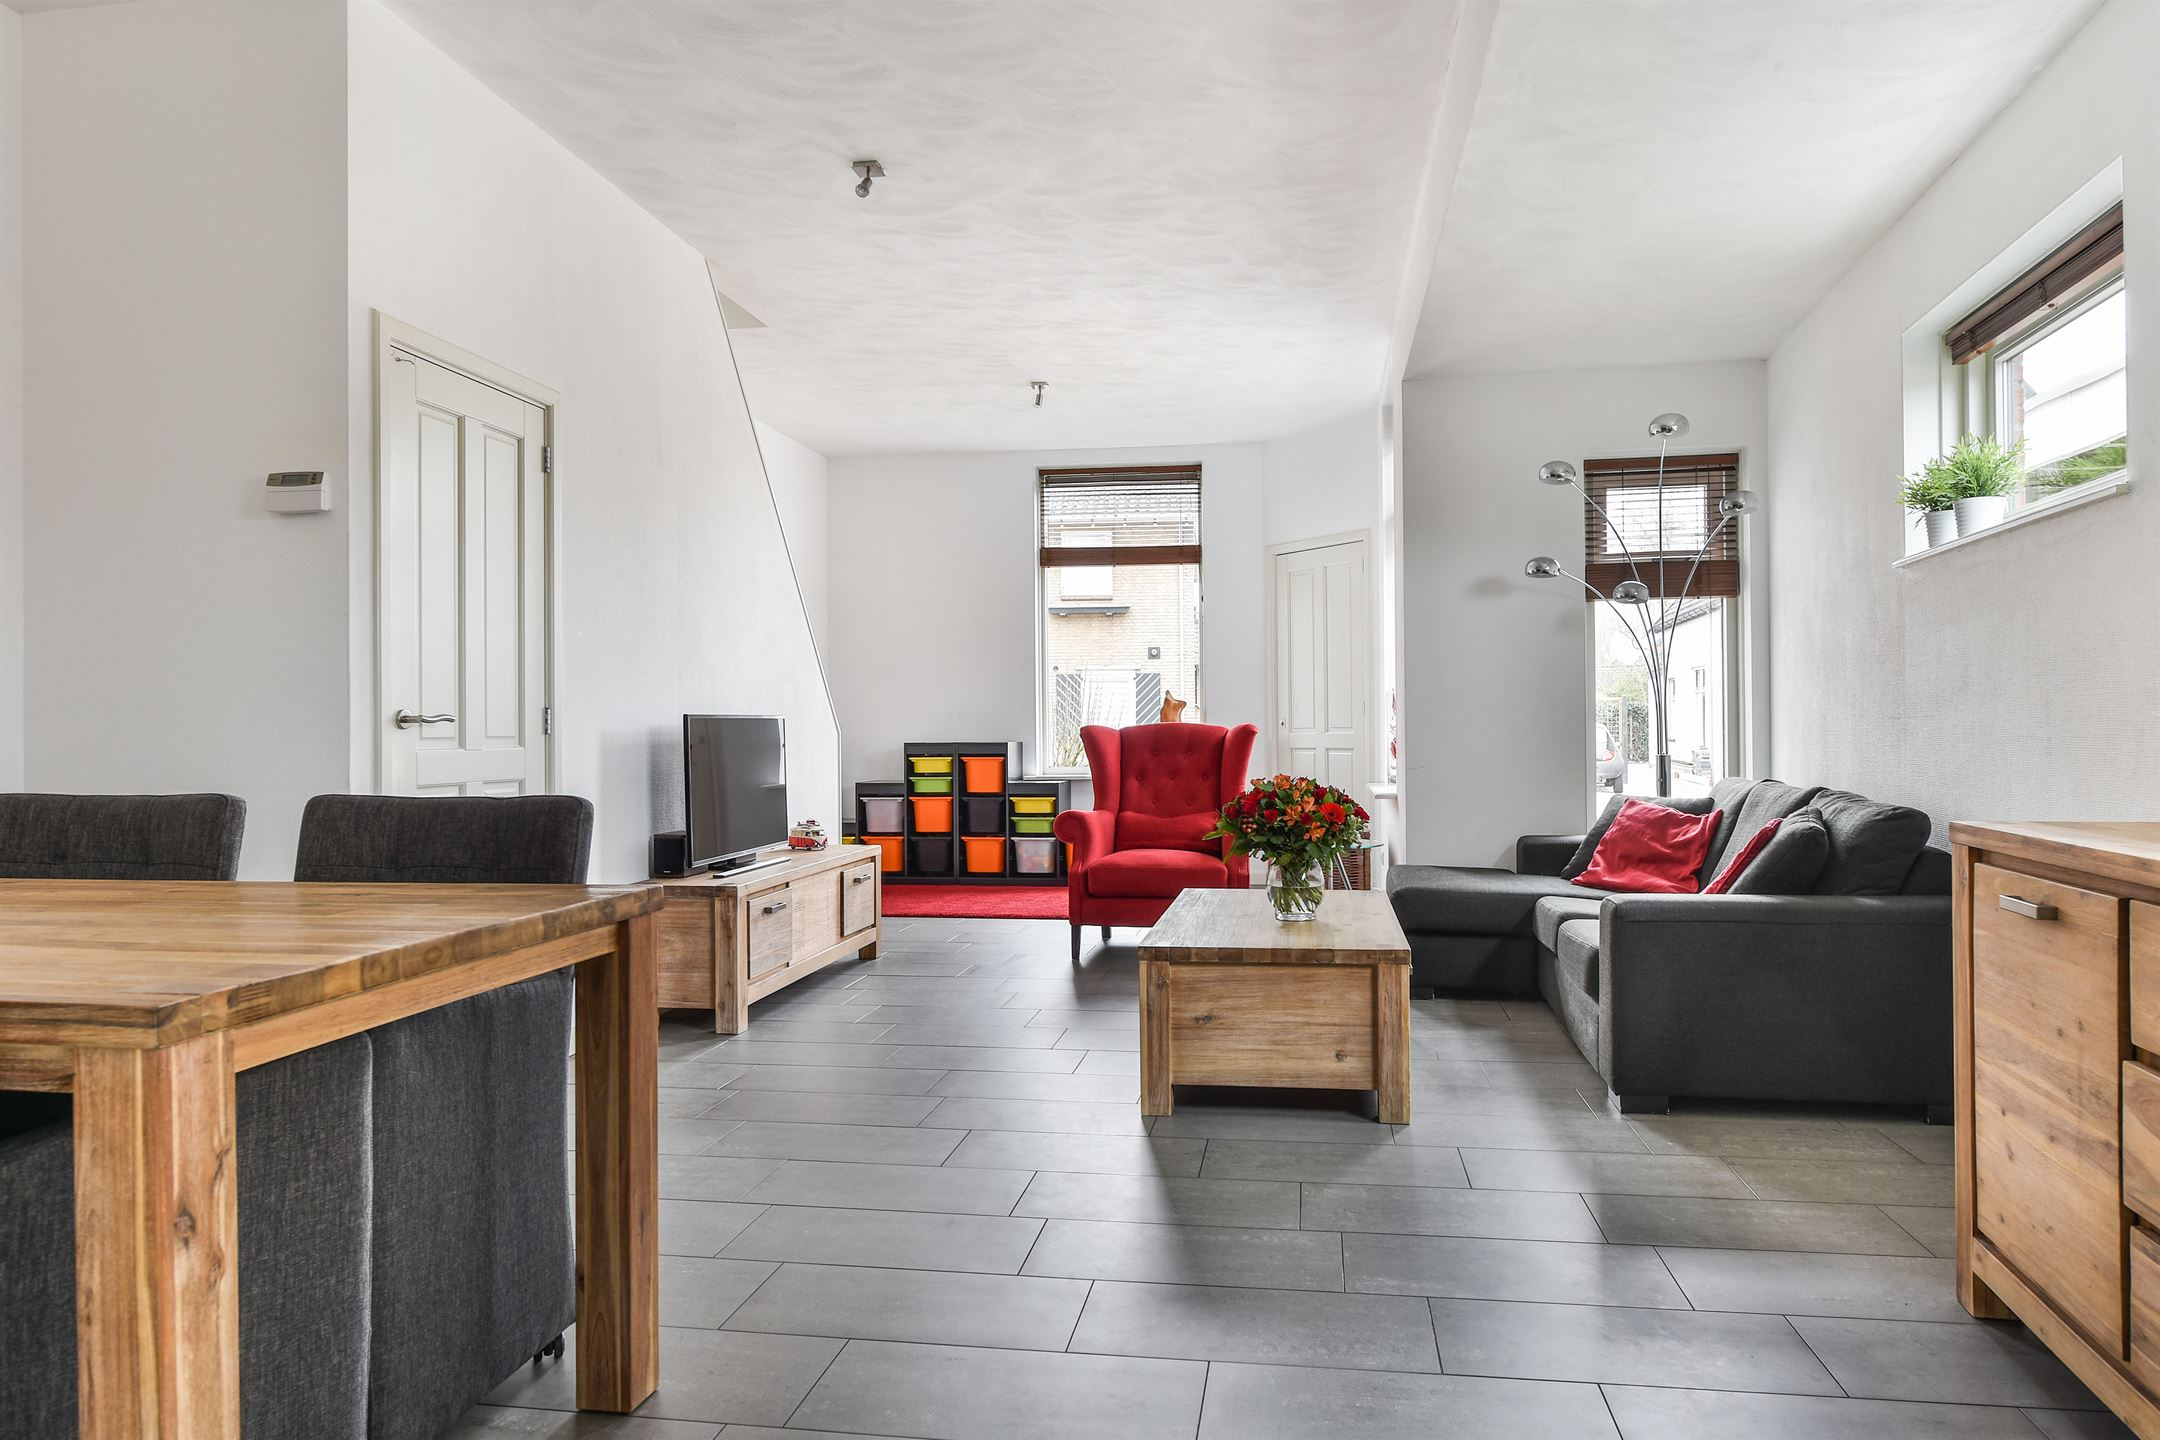 Keuken Badkamer Apeldoorn : Huis te koop elsweg gx apeldoorn funda